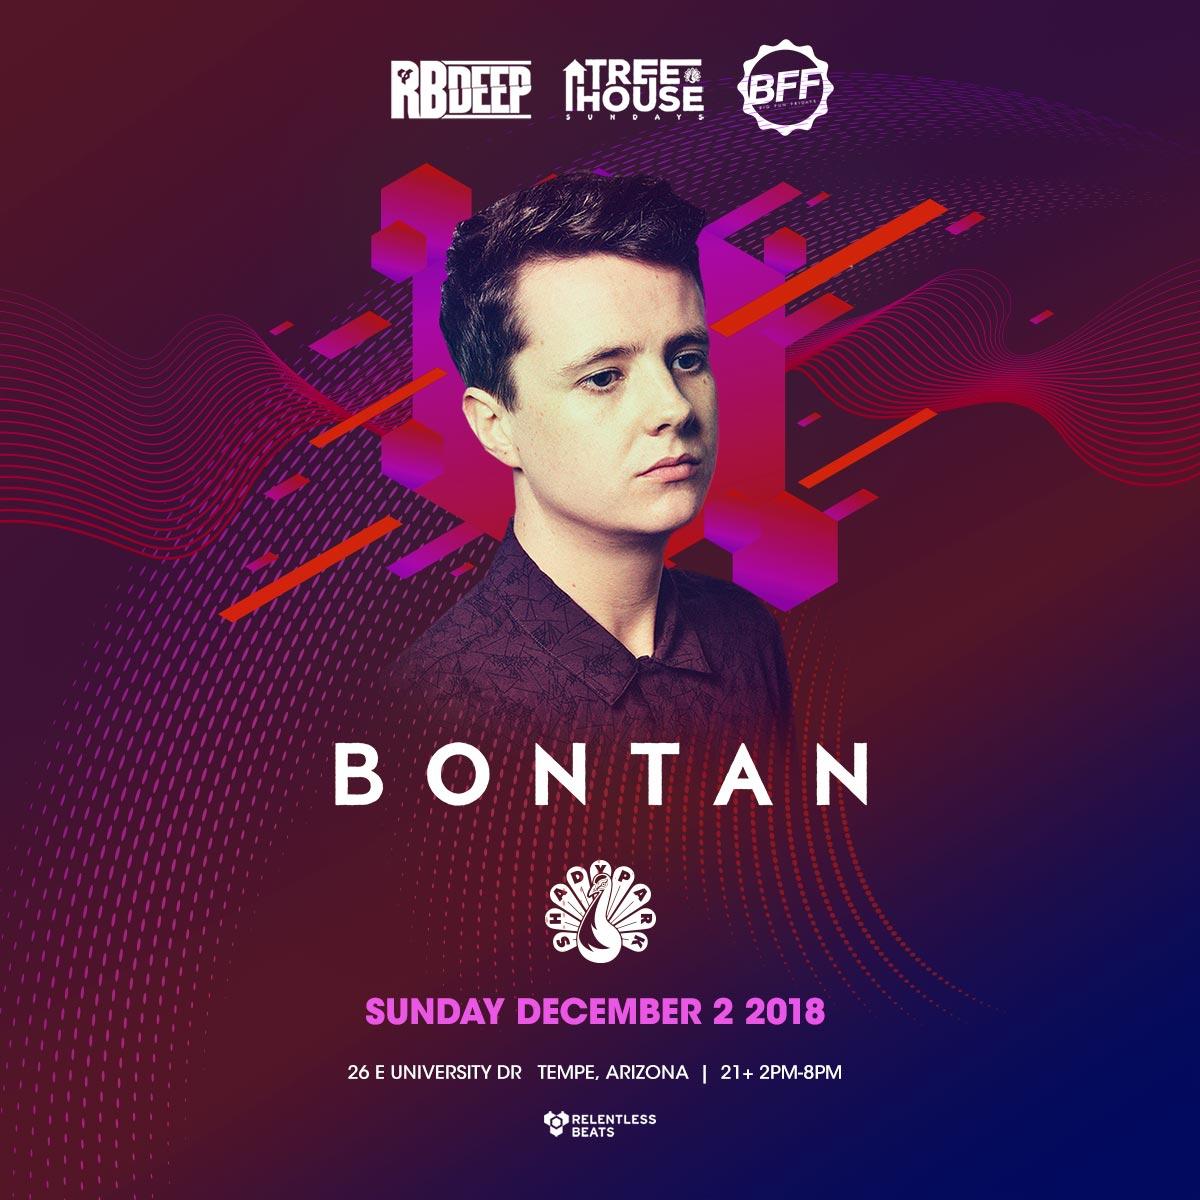 Flyer for Bontan